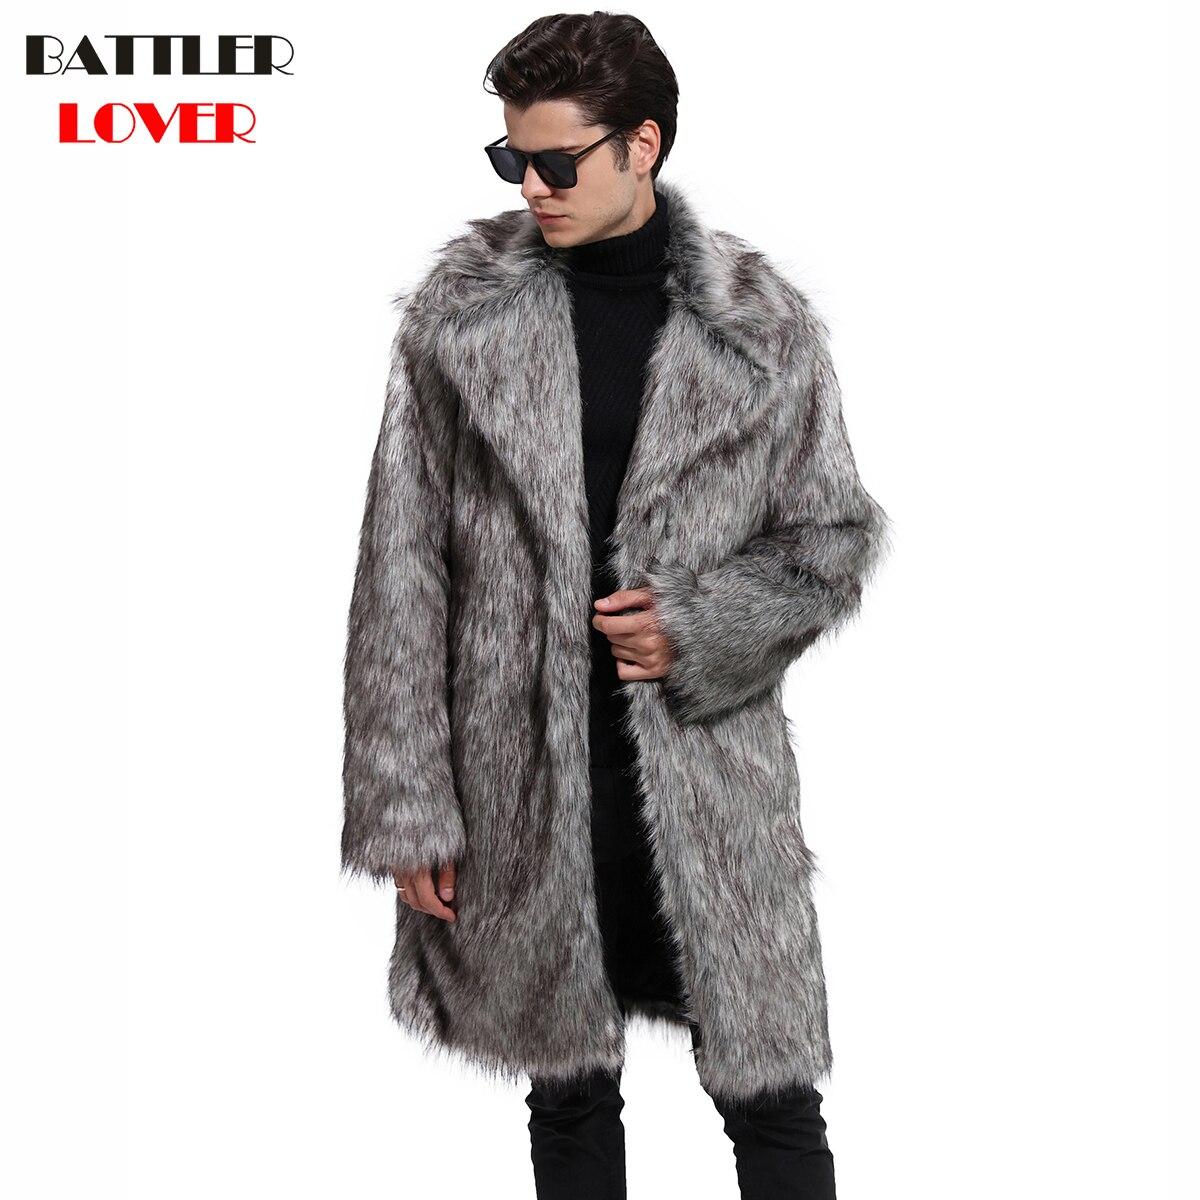 2018 Mens Fur Coat Winter Warm Outwear Coats Faux Fur Men Punk Parka Jackets Hombre Leather Overcoat Genuine Fur Brand Clothing